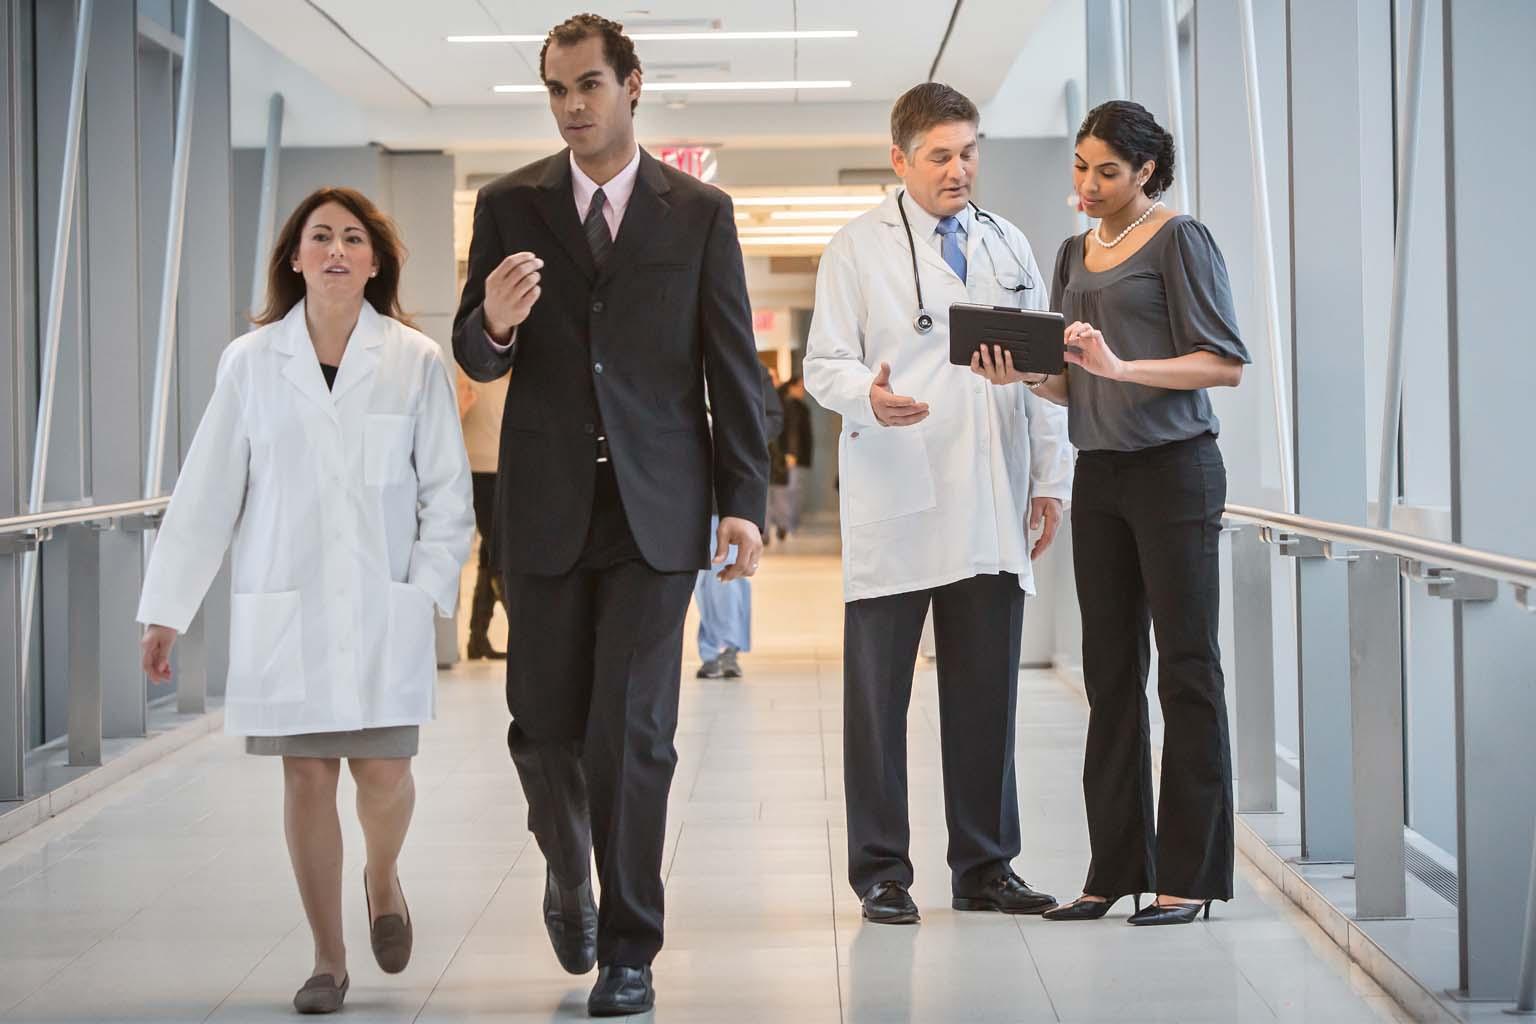 Directors-of-nursing